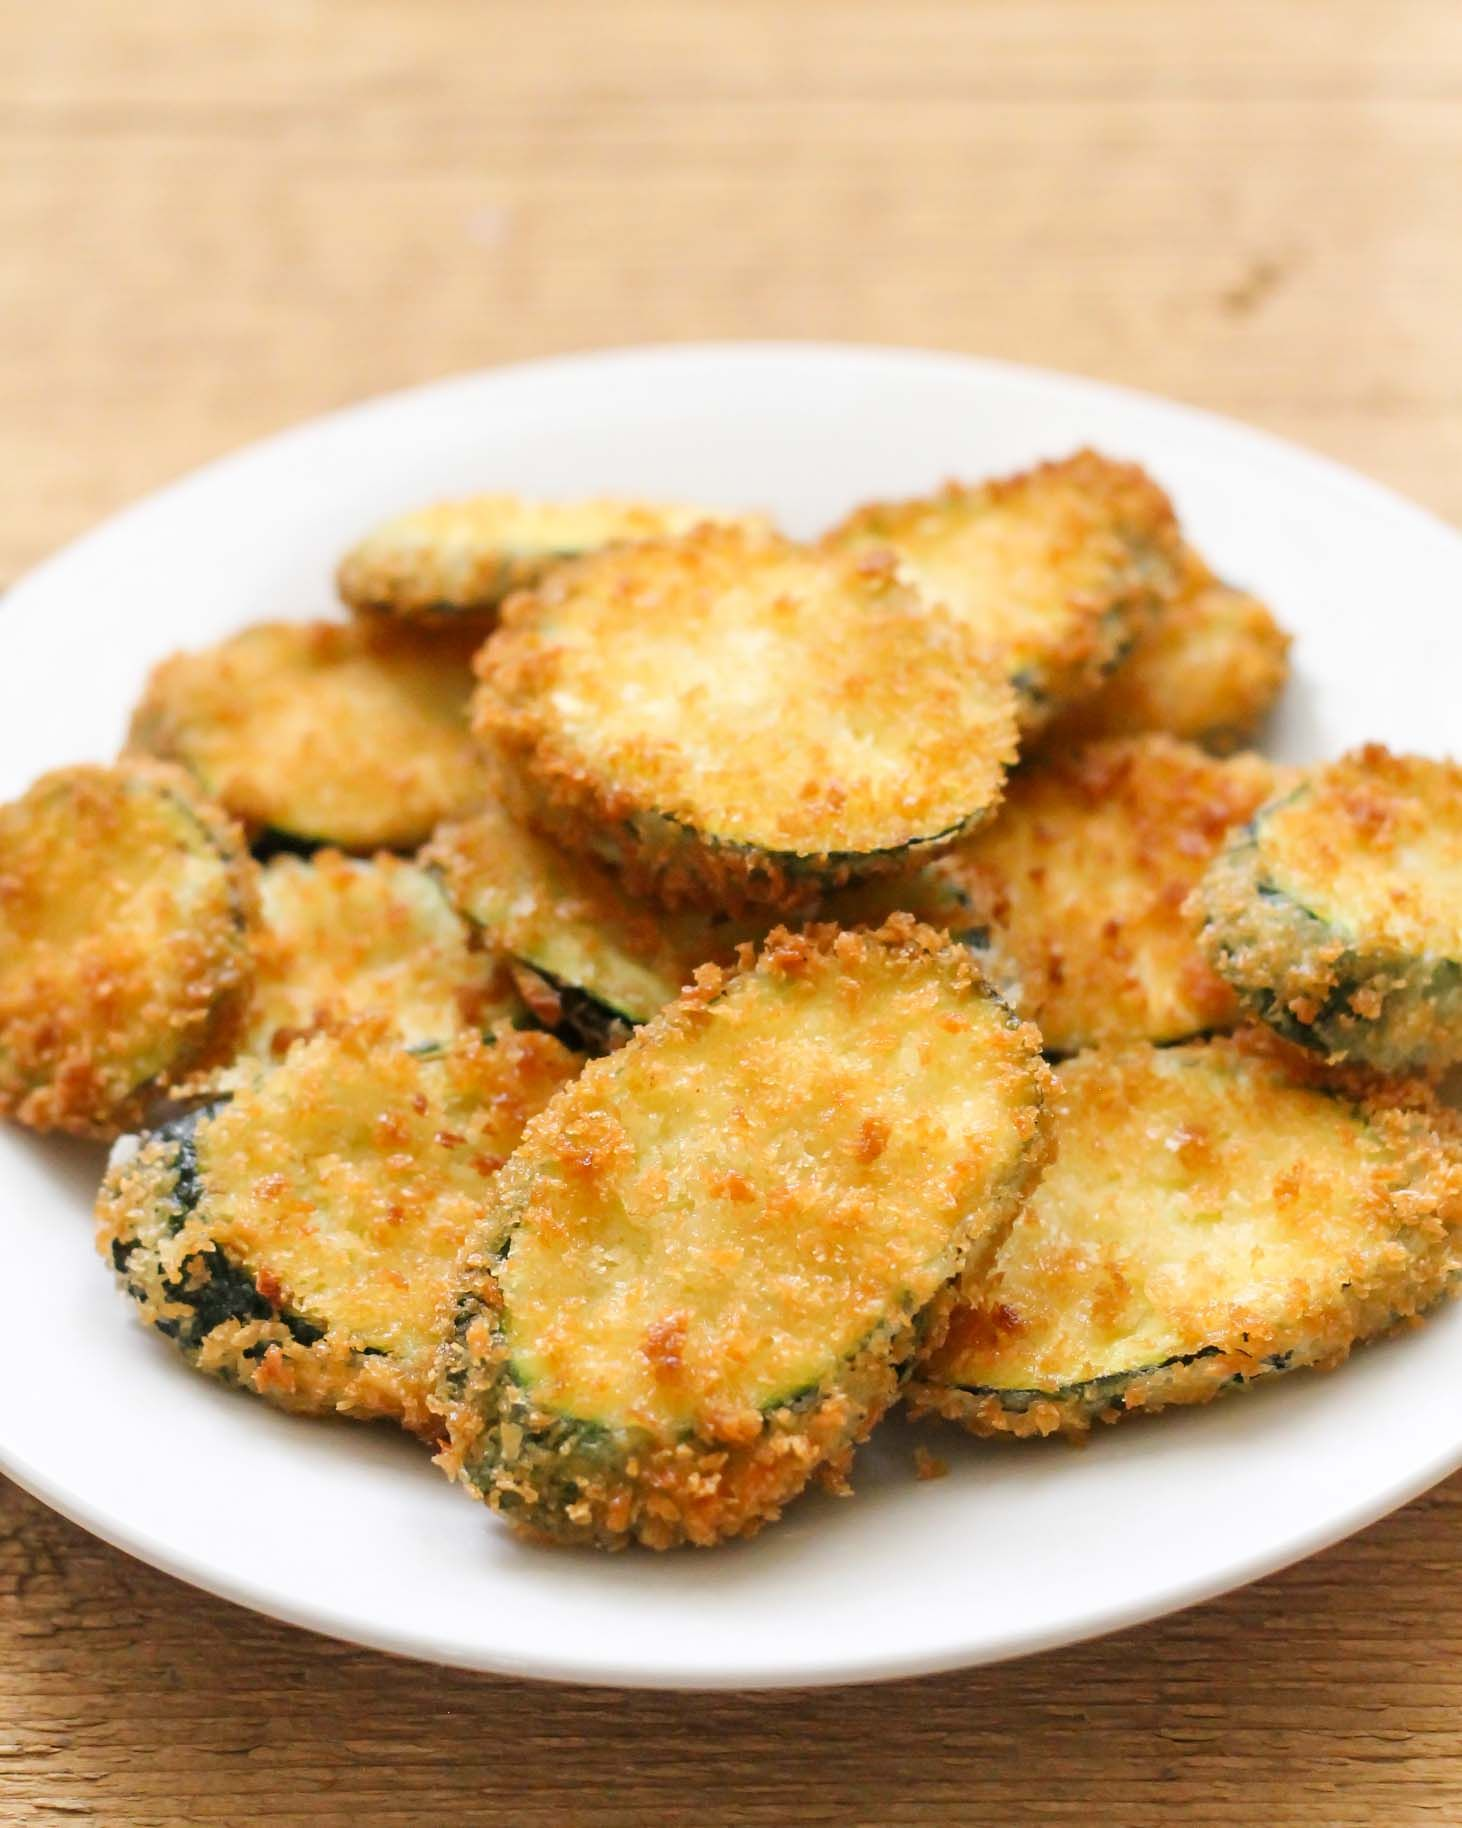 Fried Zucchini Recipe Fried zucchini recipes, Zucchini